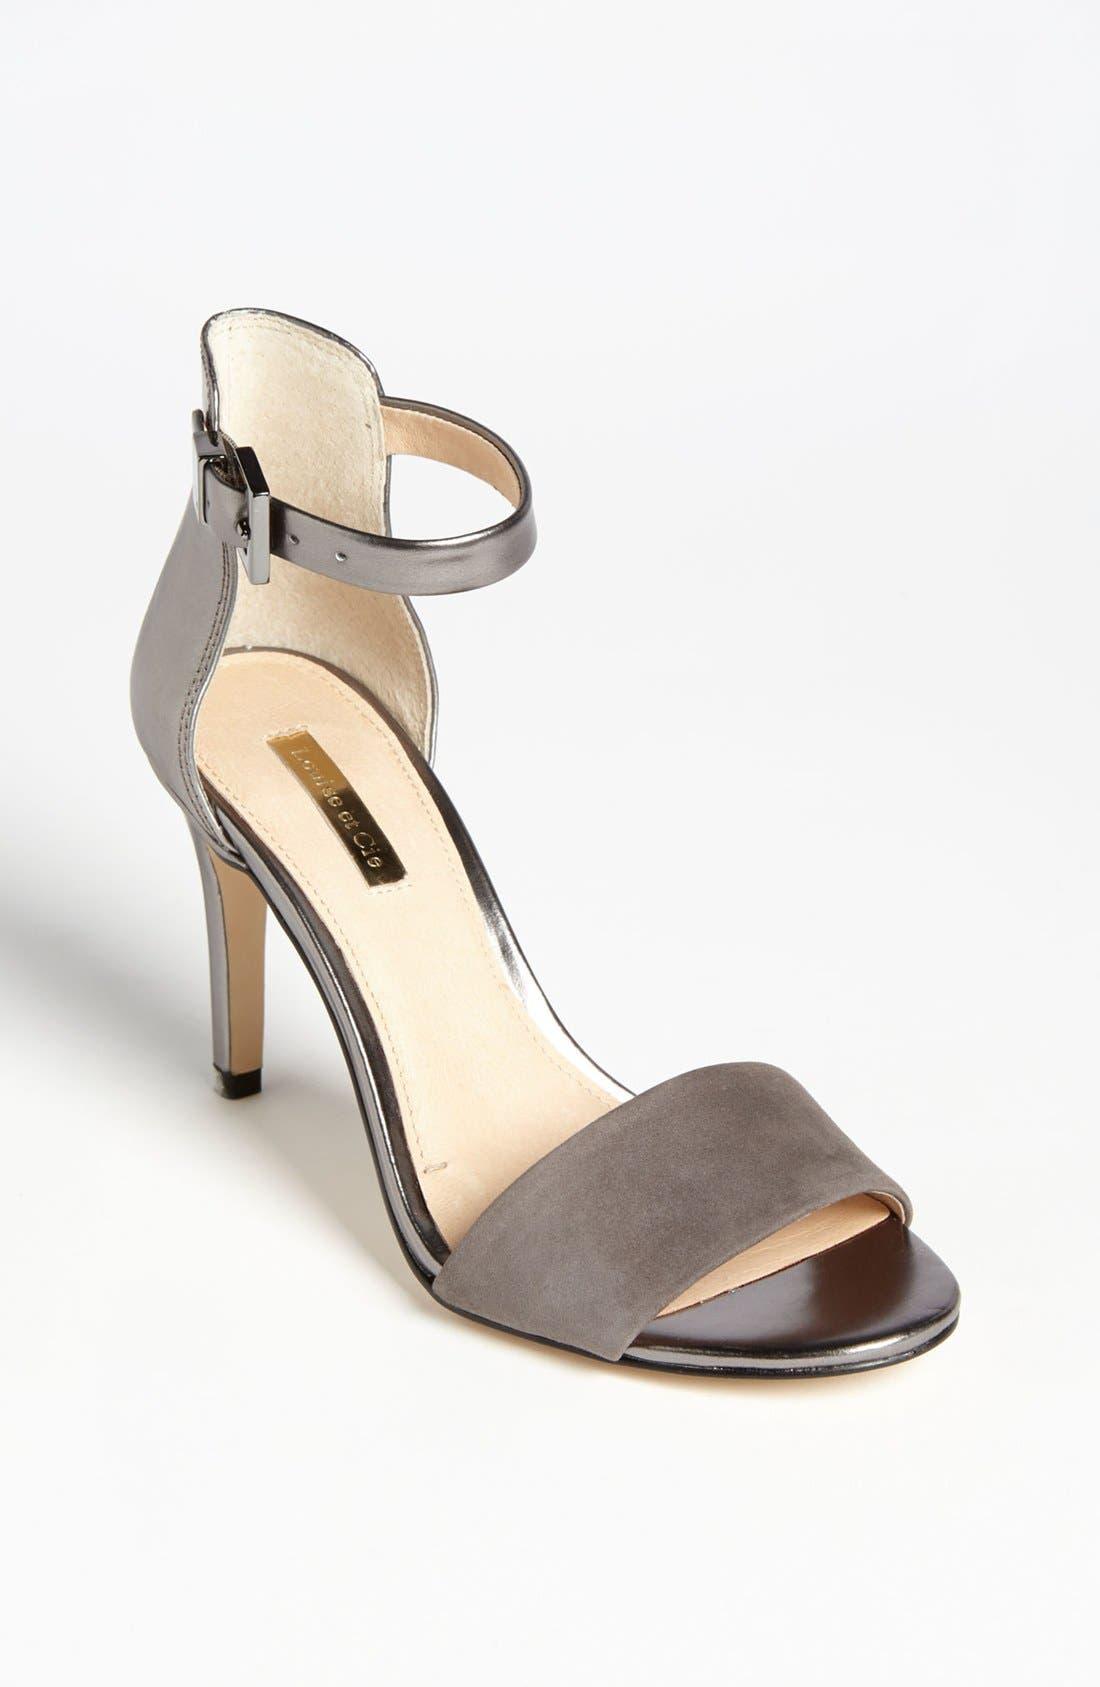 Alternate Image 1 Selected - Louise et Cie 'Olive' Sandal